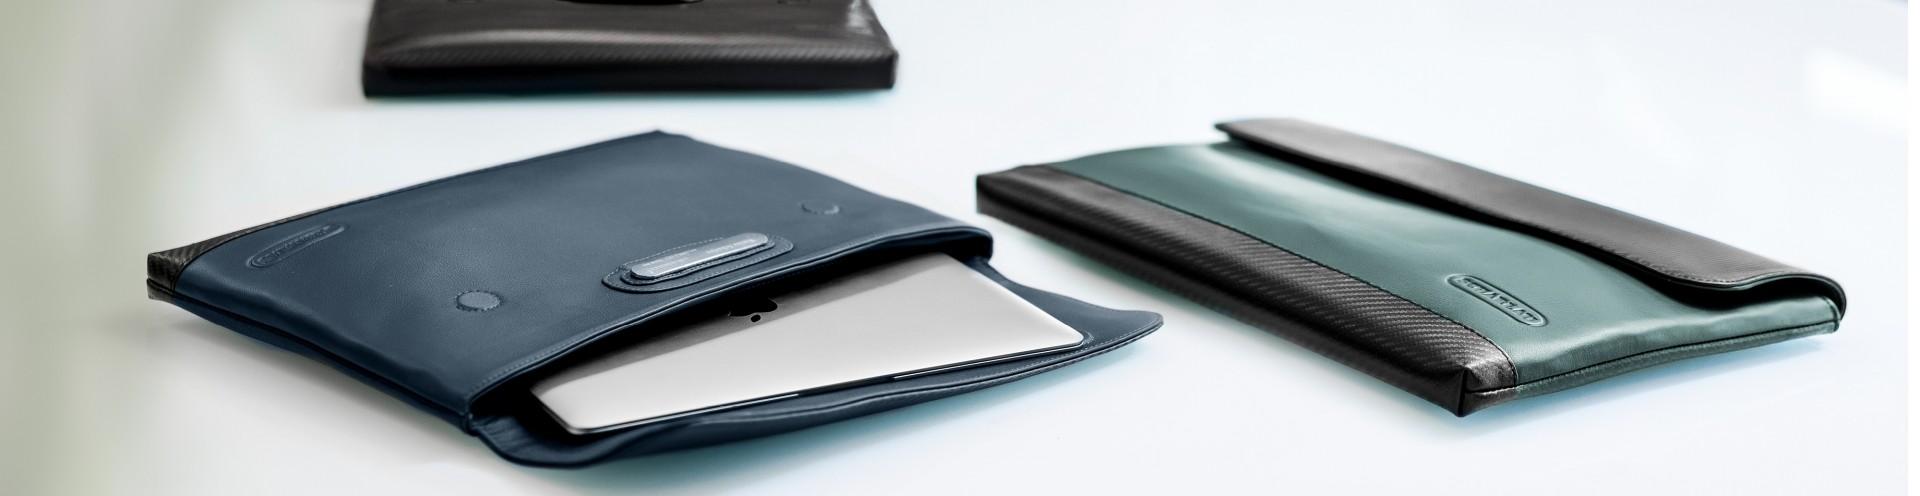 Men's Customizable Leather Laptop Sleeves